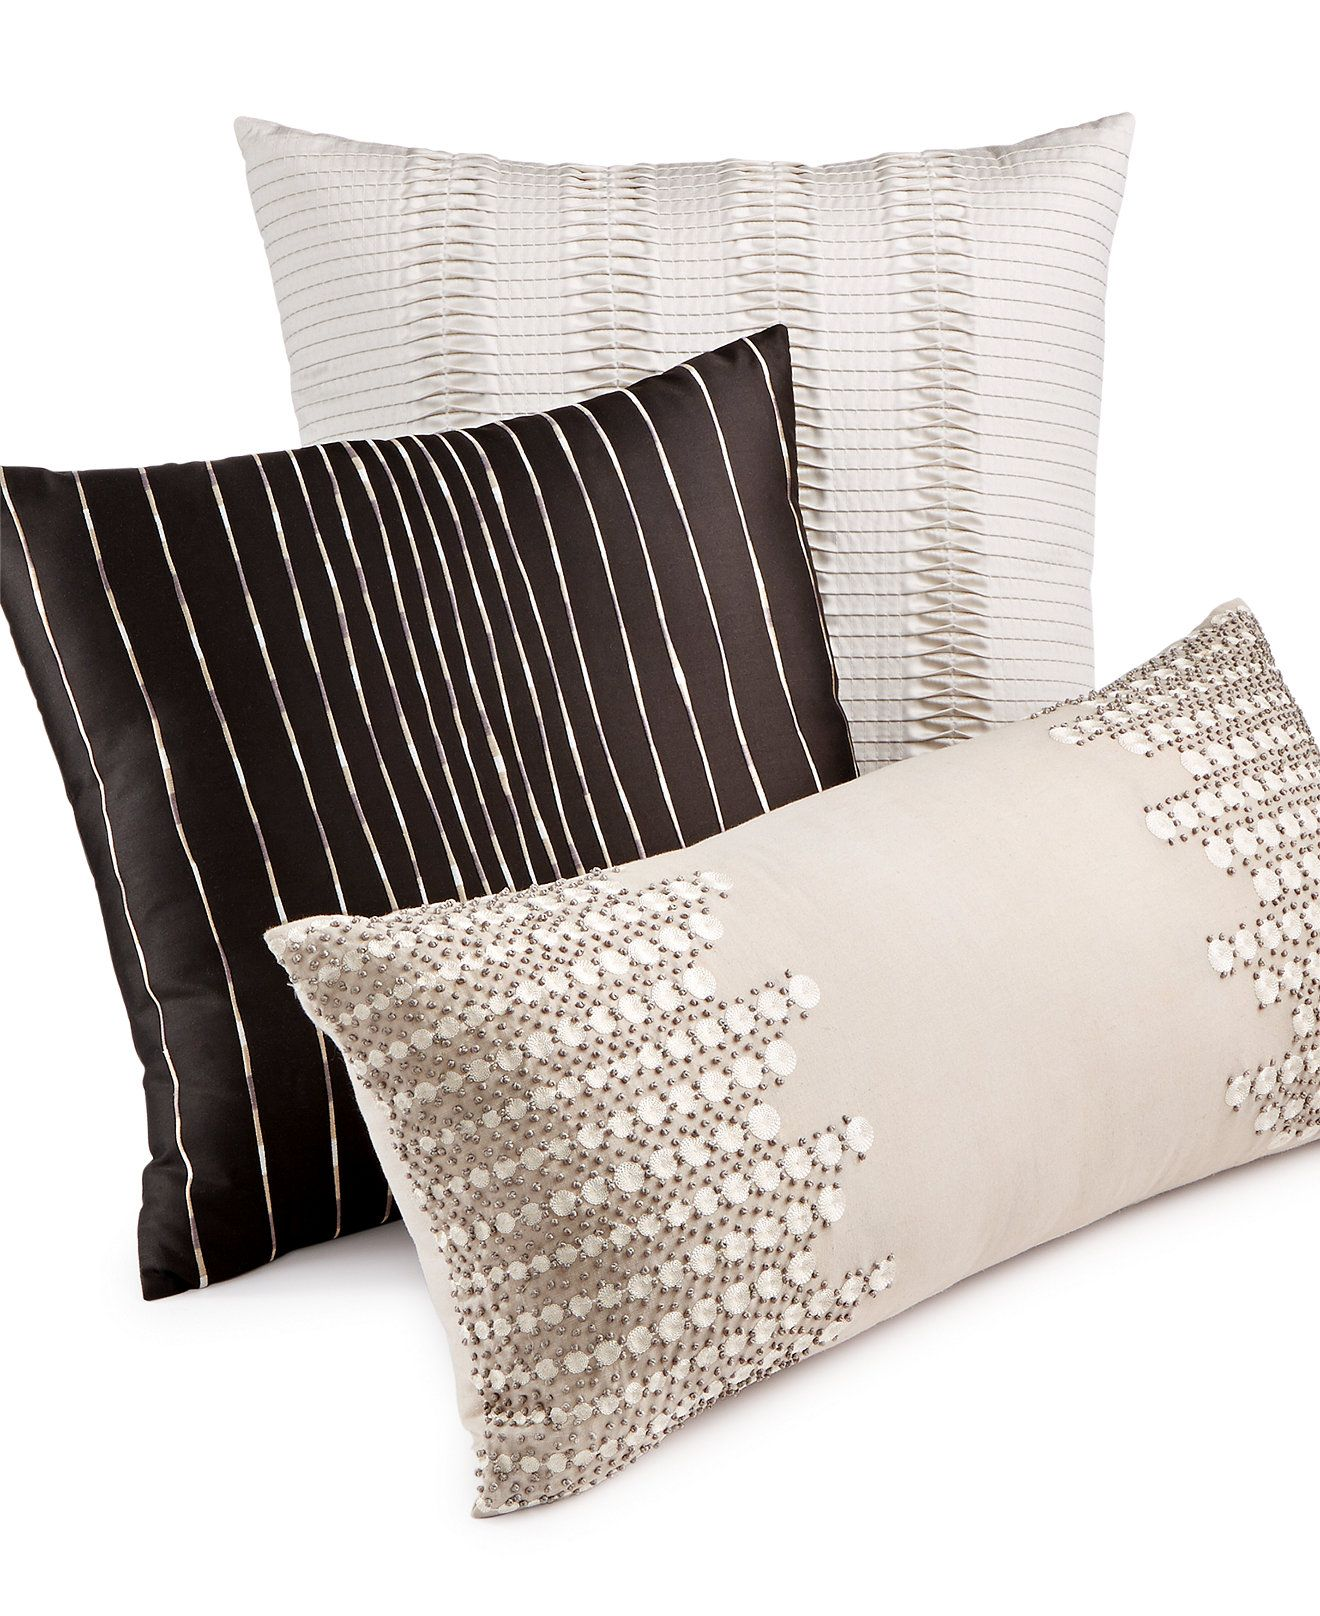 Hotel Collection Emblem Decorative Pillow Collection Decorative